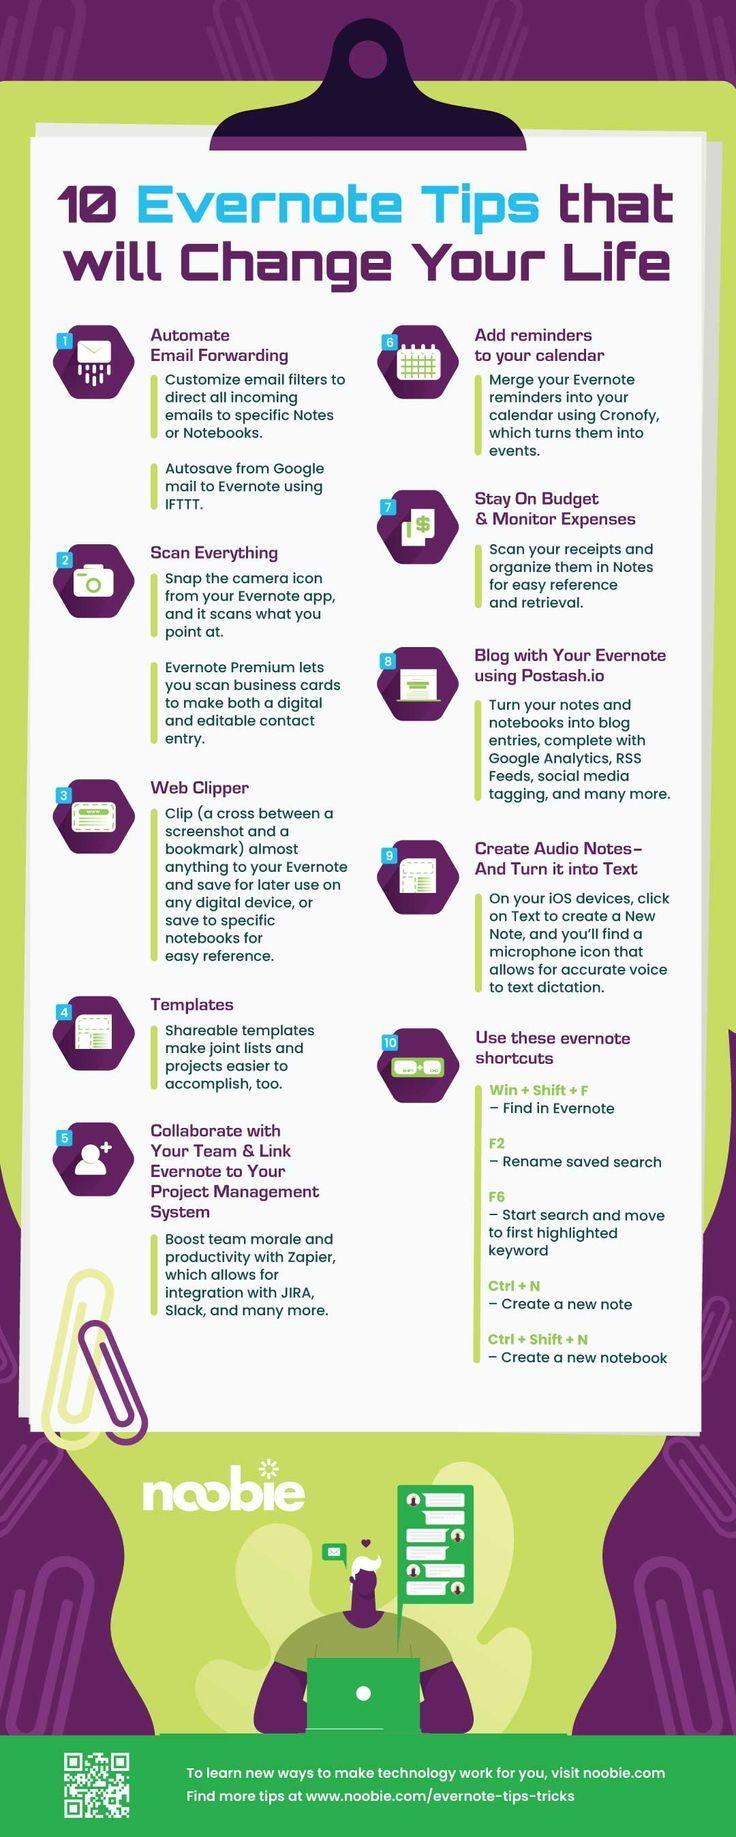 10 Evernote Tips Tricks You Should Master Infographic Noobie In 2020 Evernote Evernote Template Infographic